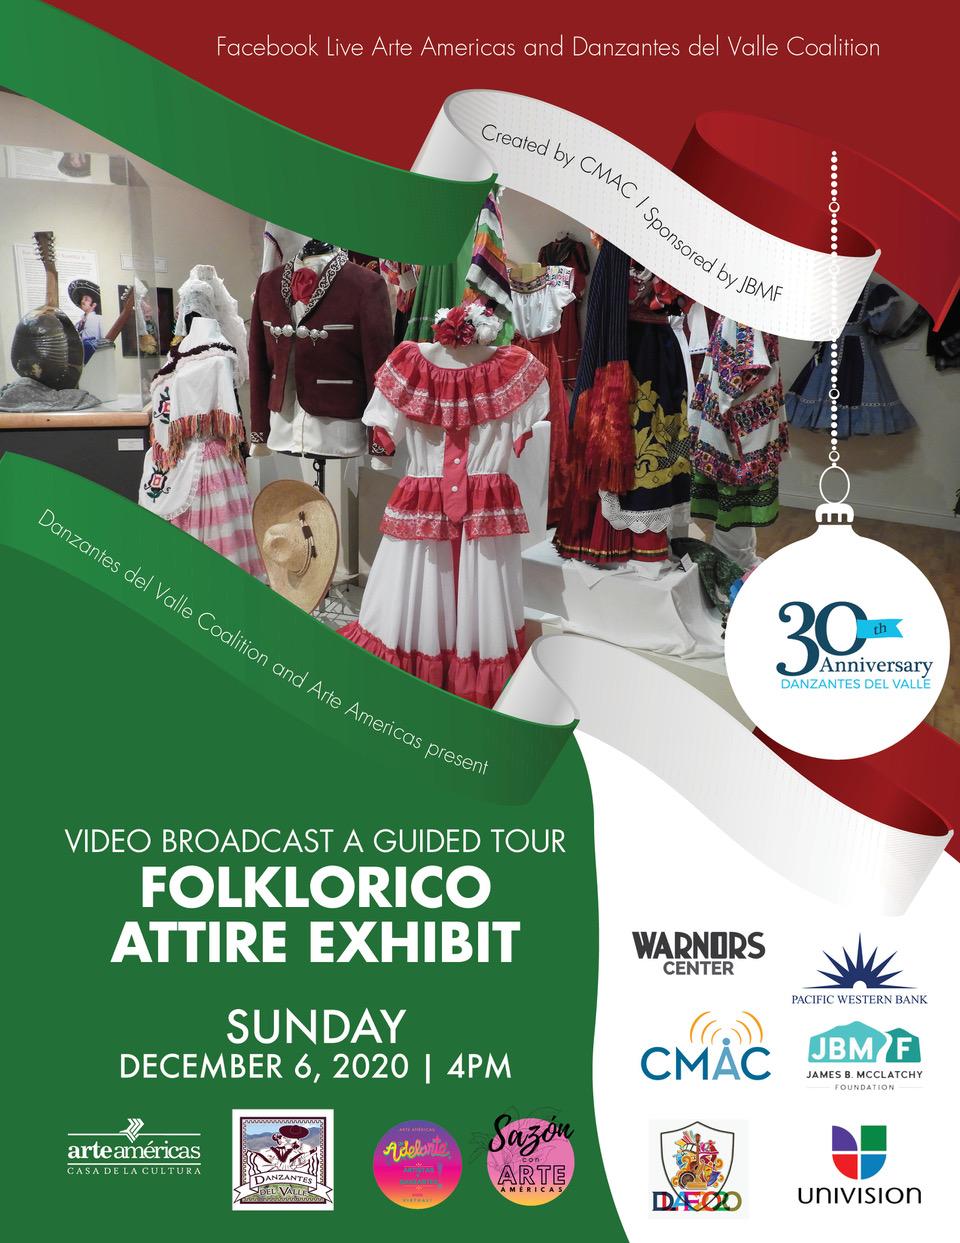 folklorico attire exhibit